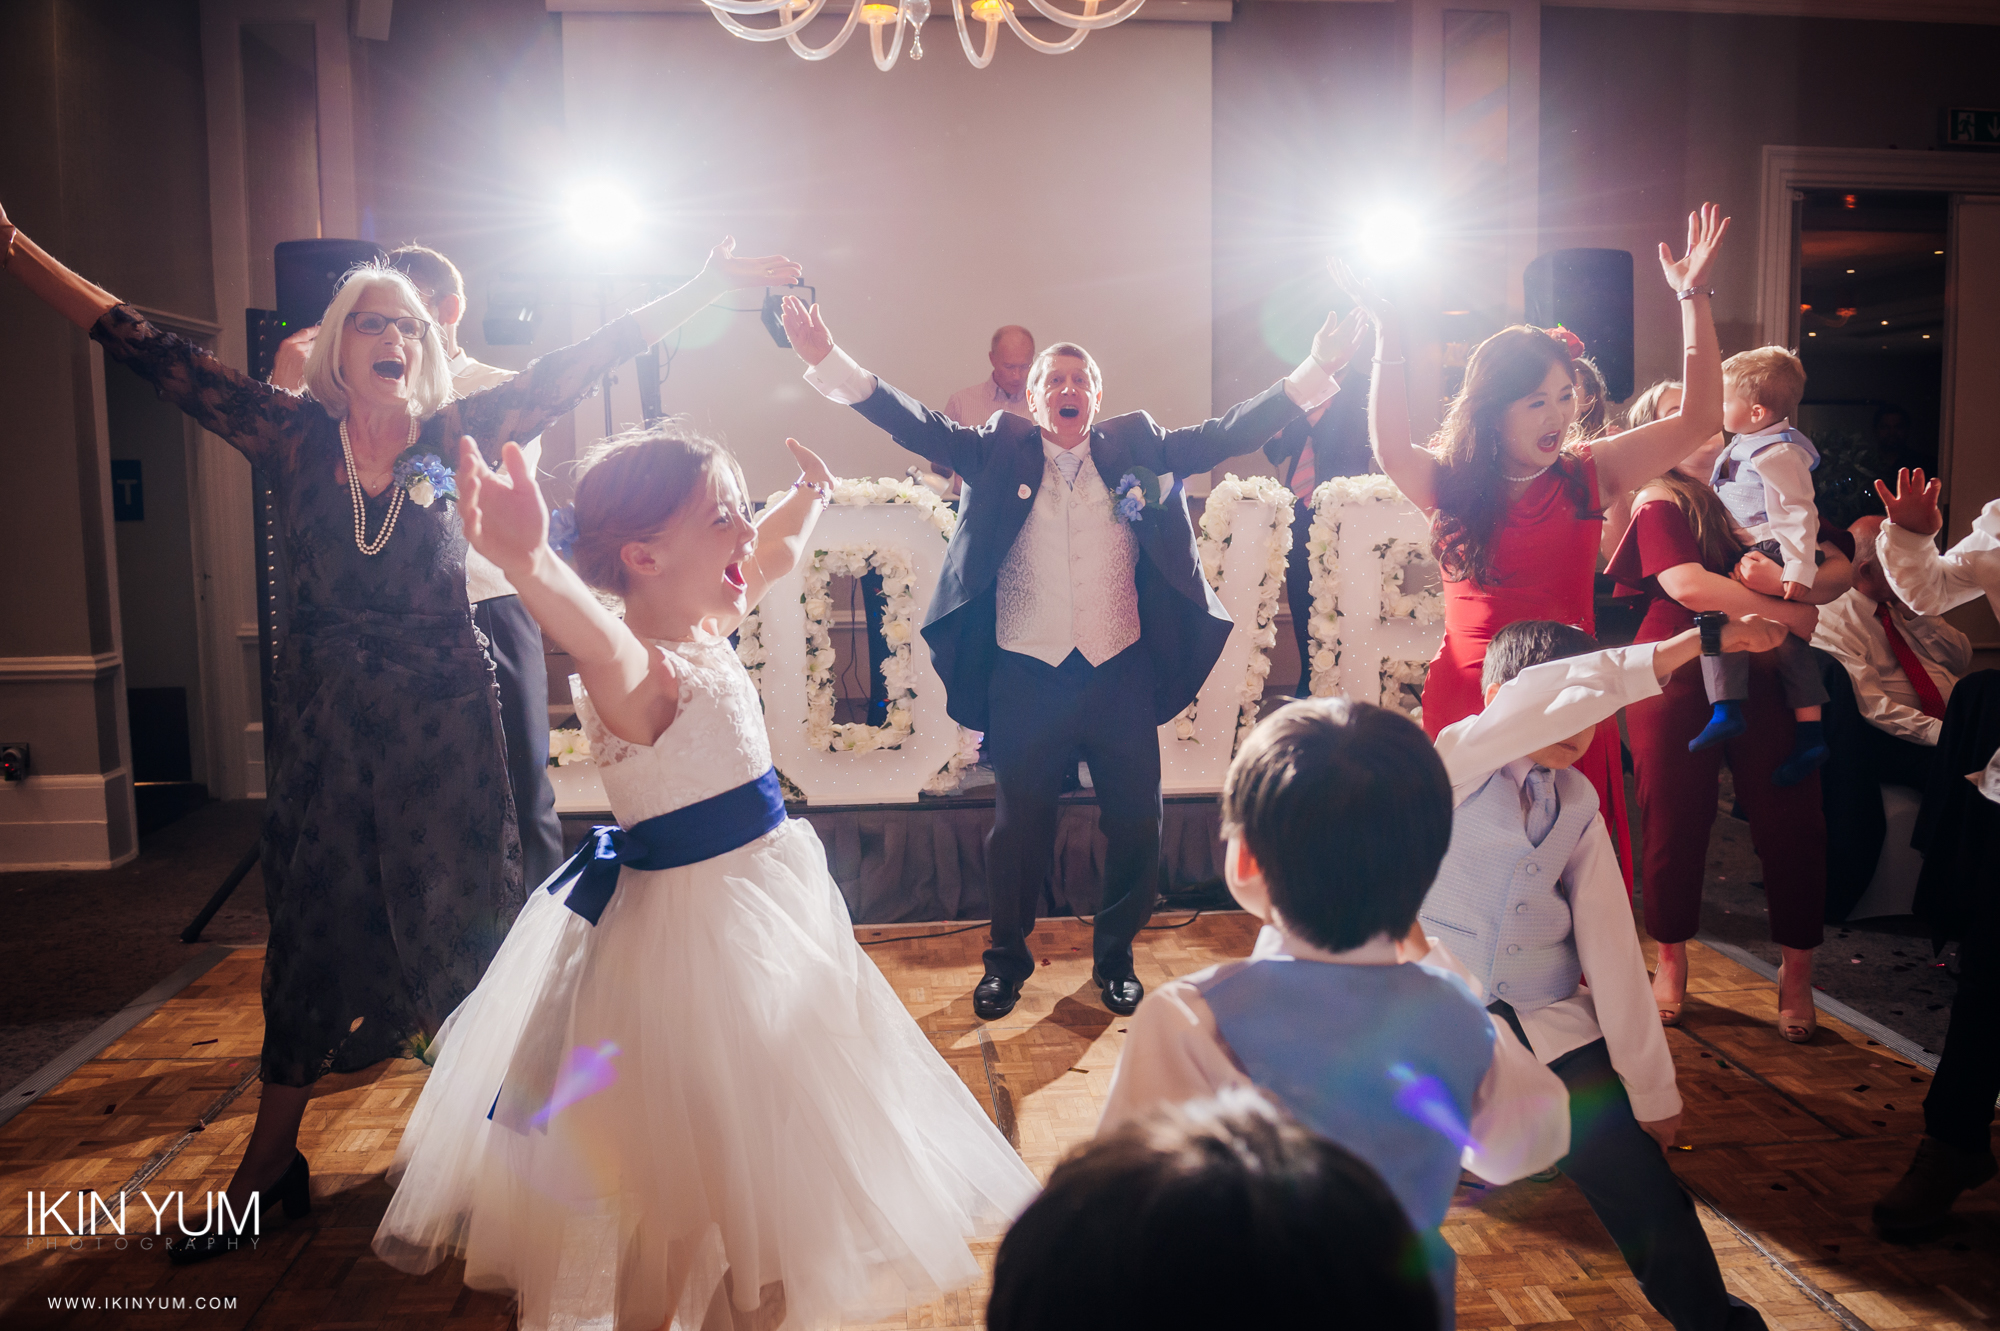 Teresa & Johnathan Weddong Day - First Dance & Party-0070.jpg